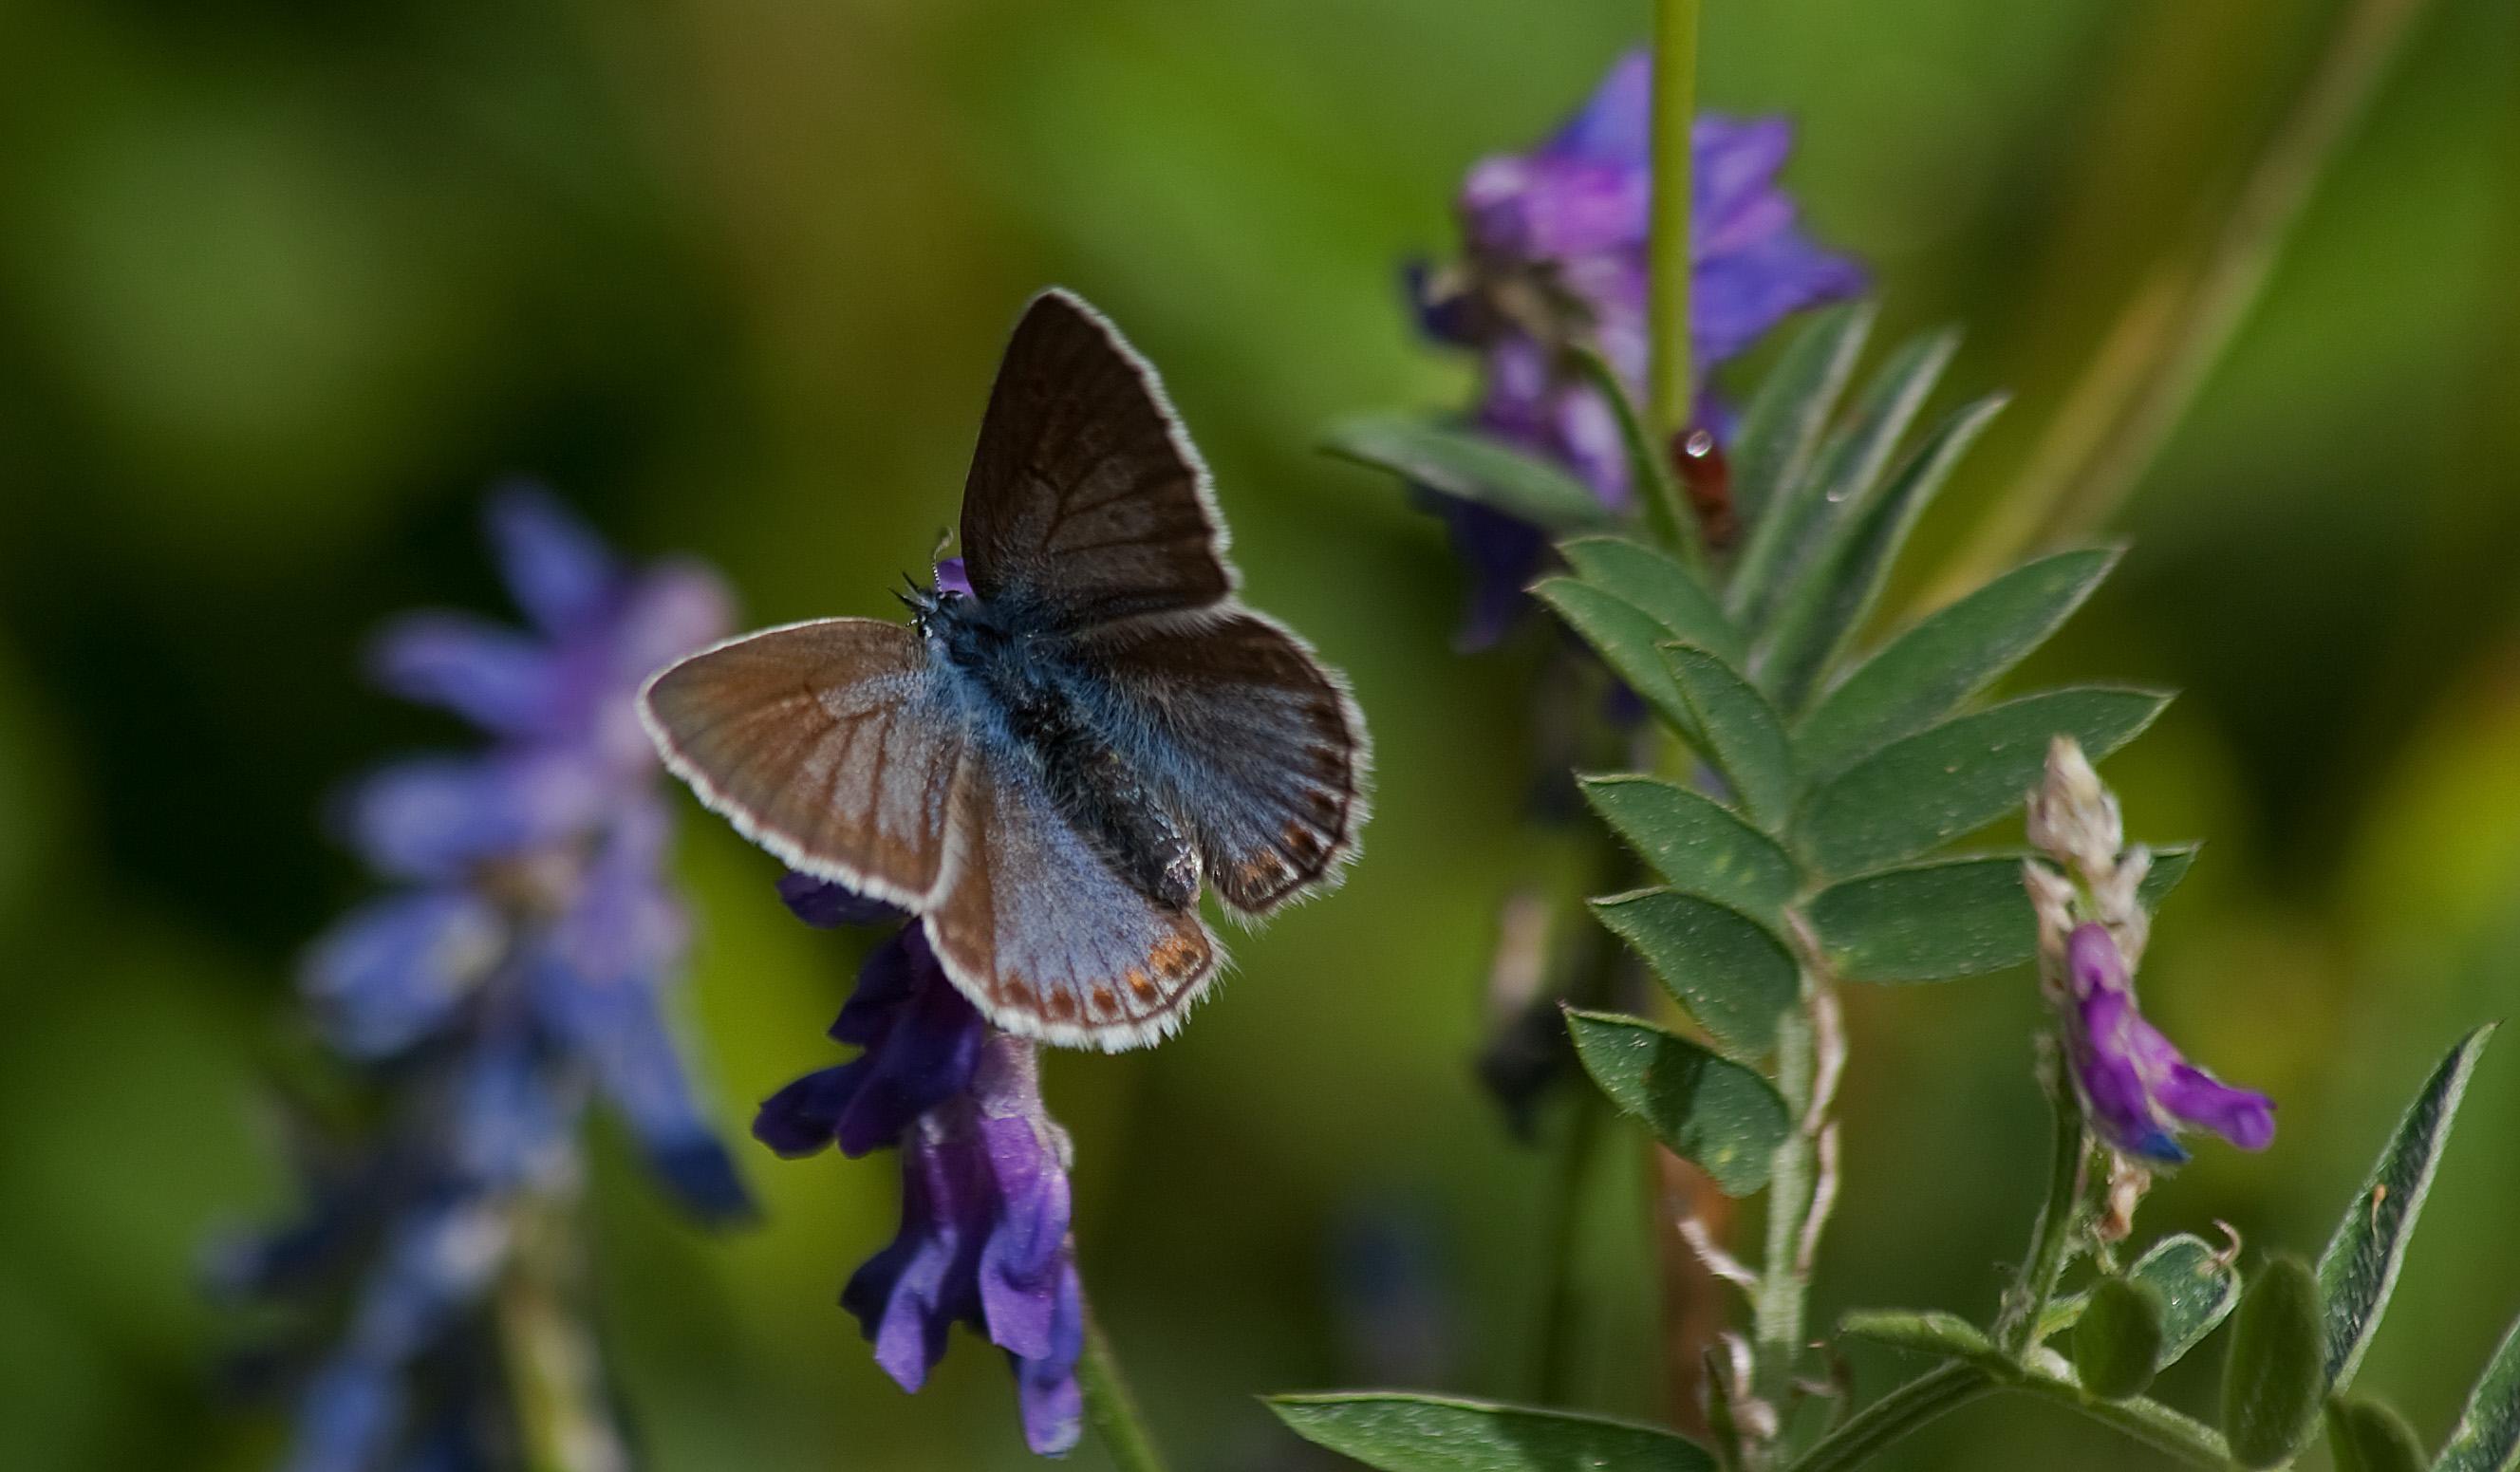 Giv plads til sommerfuglen i din have